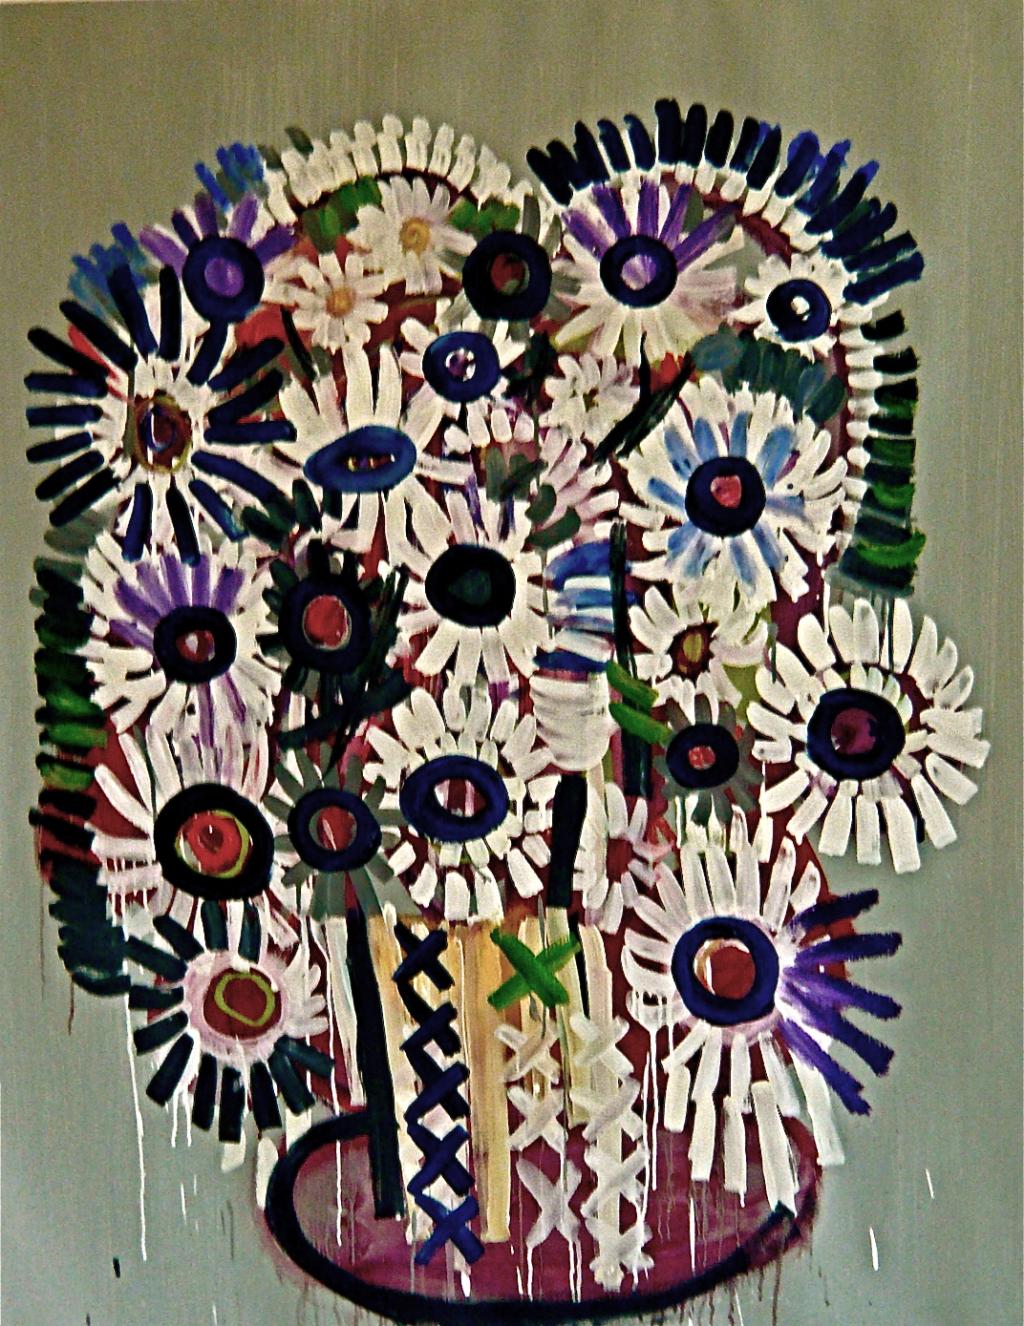 Untitled (Flowers in vase),  Gerben Mulder